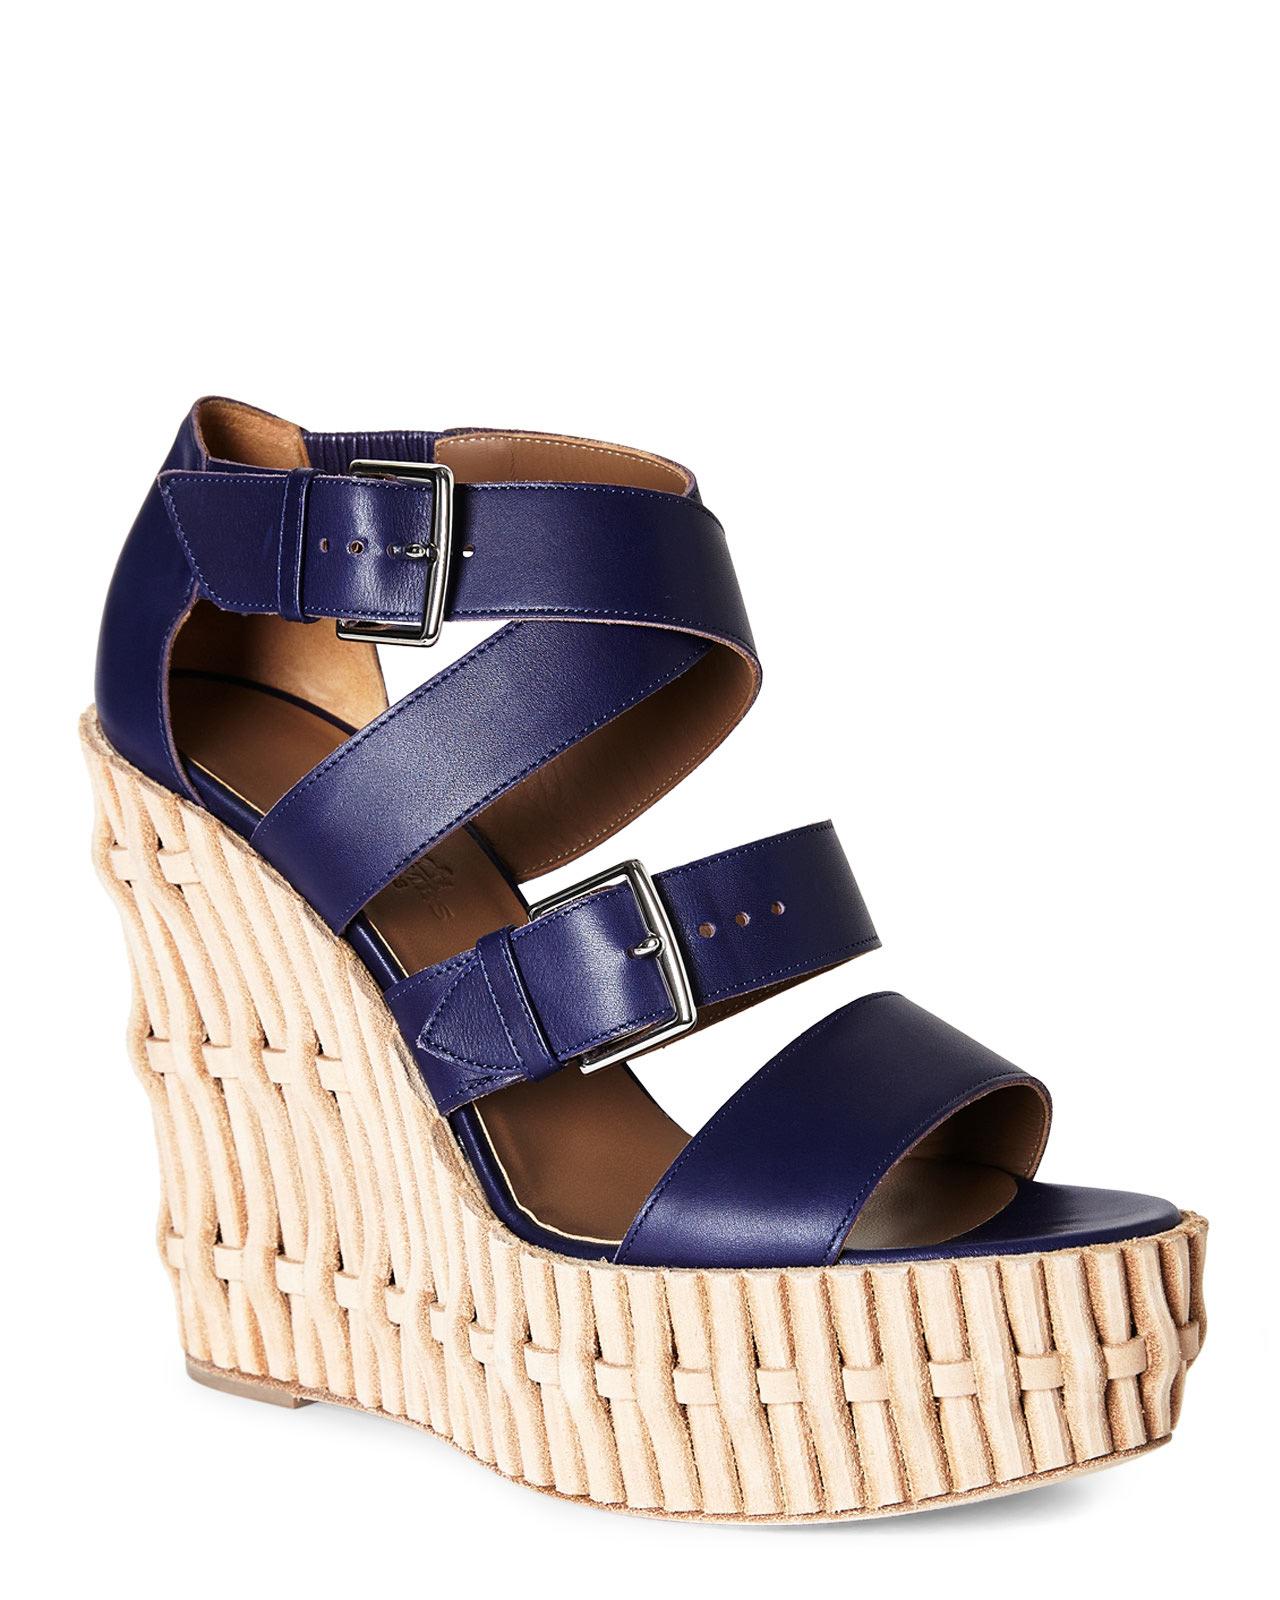 6e3a73811805 Lyst - Hermès HermãˆS Platform Wedge Sandals in Blue